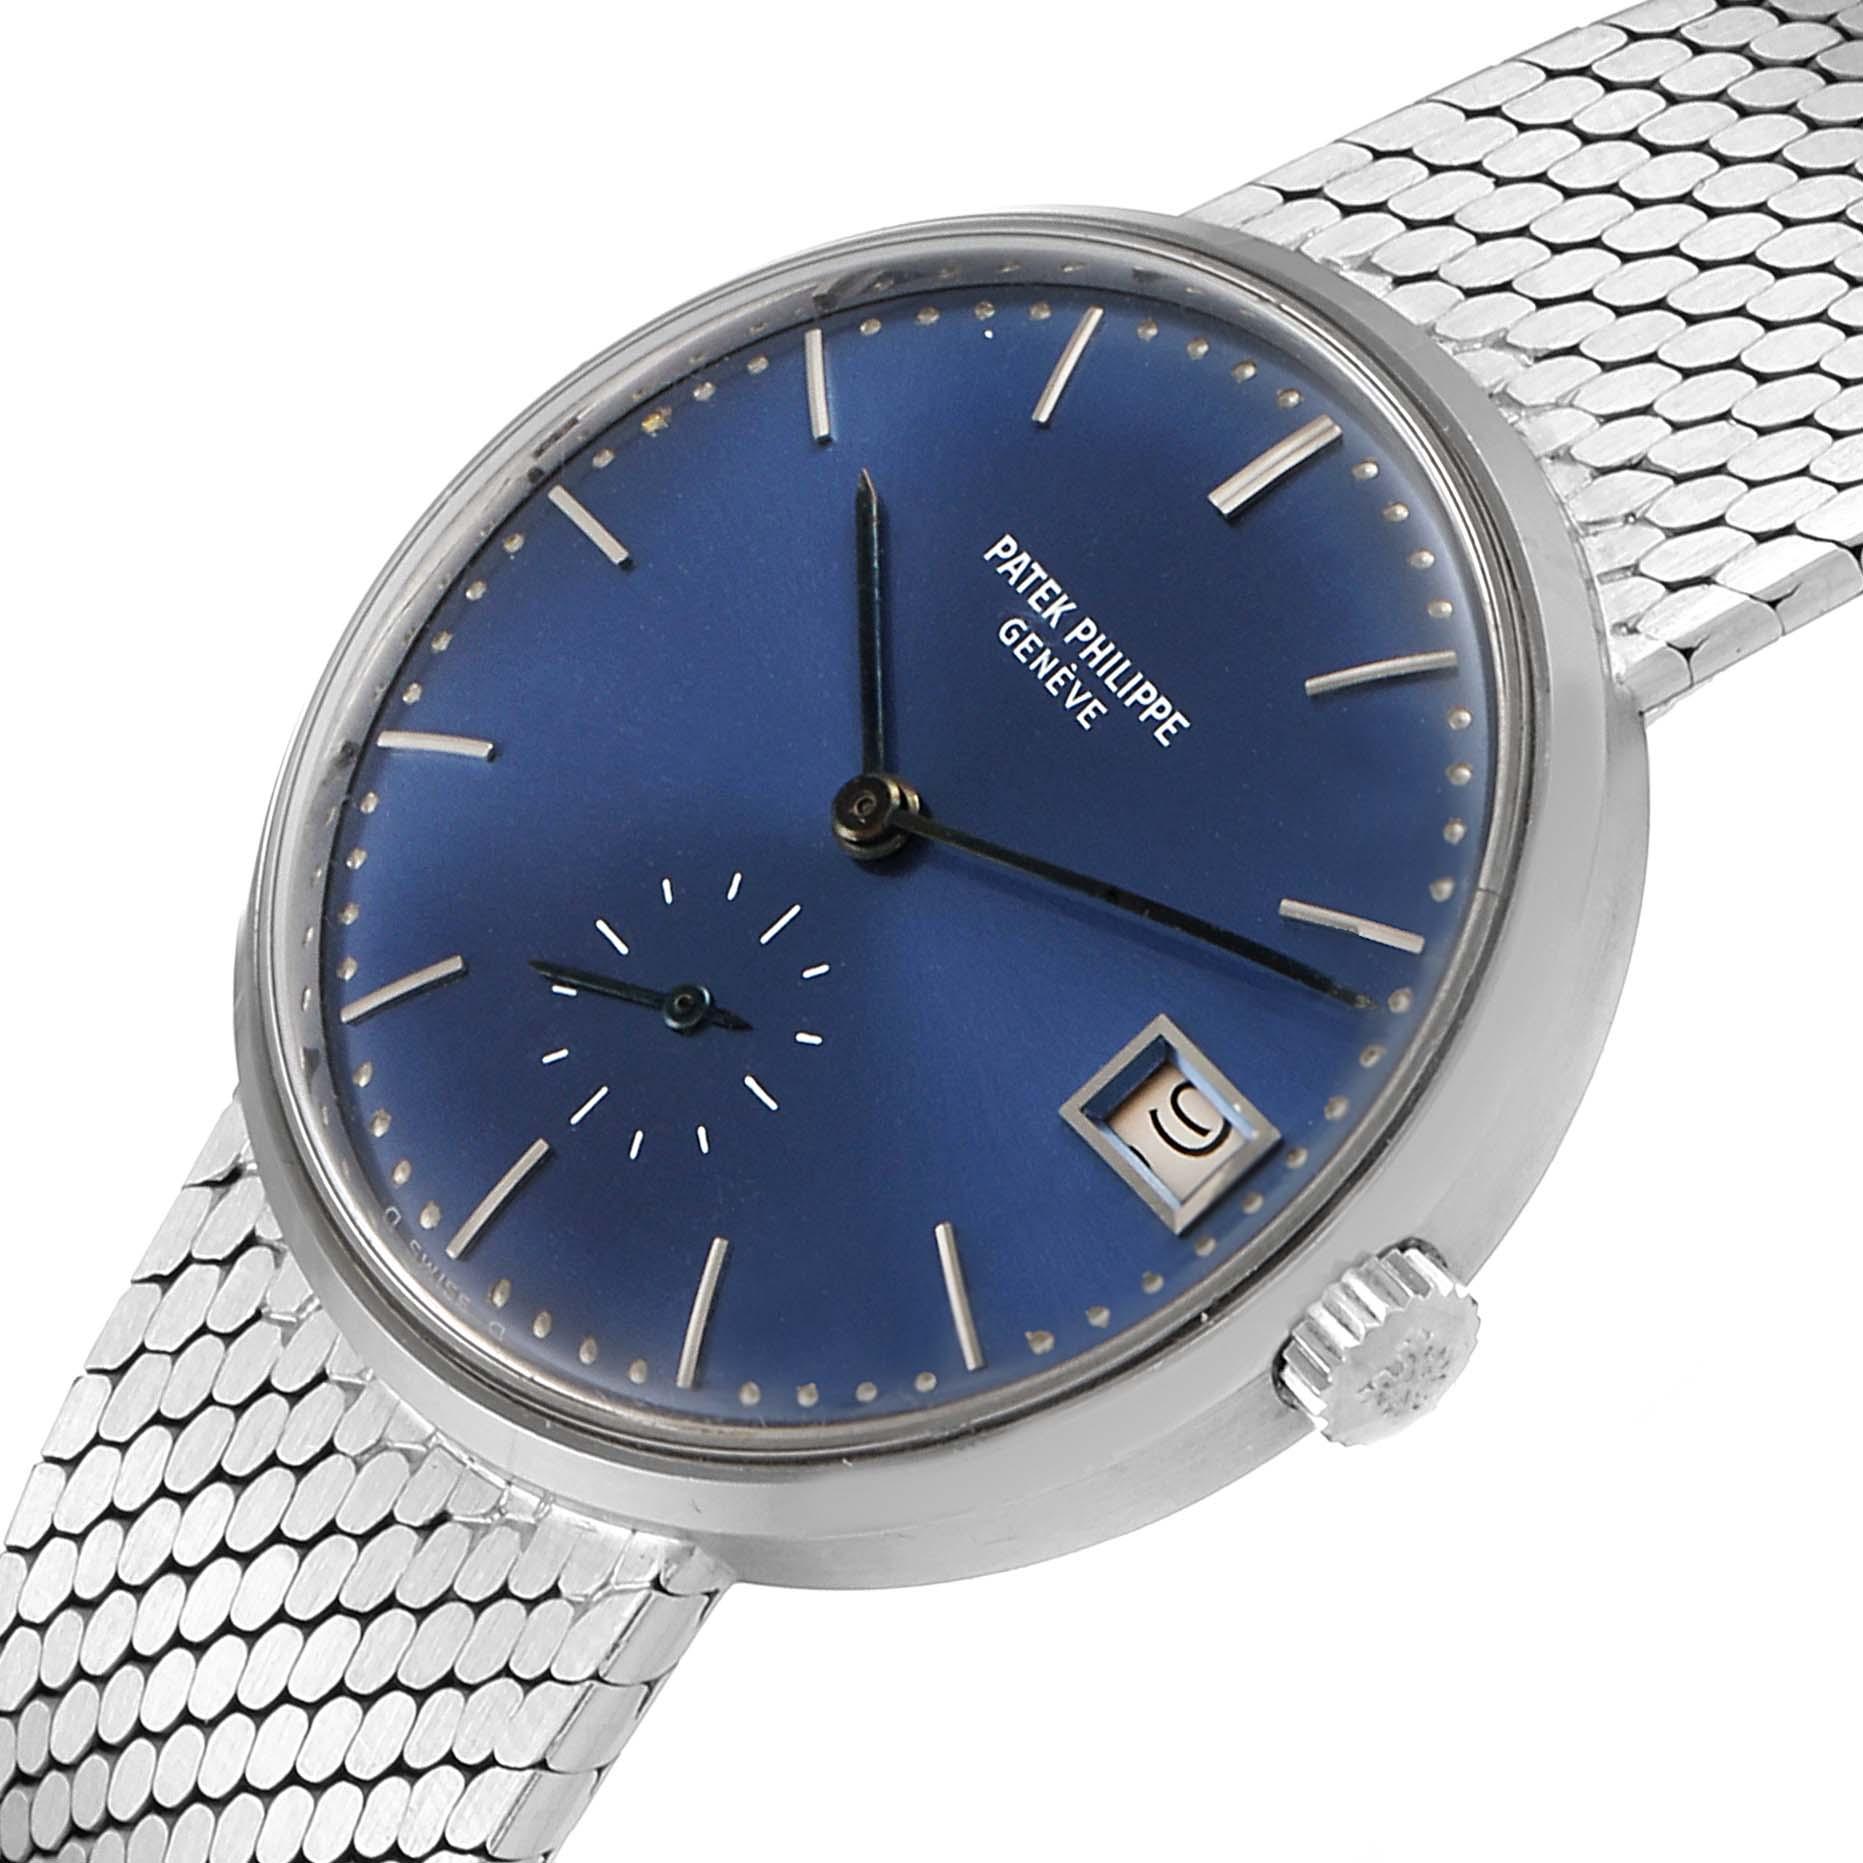 Patek Philippe Calatrava Blue Dial White Gold Vintage Automatic Watch 3514 SwissWatchExpo